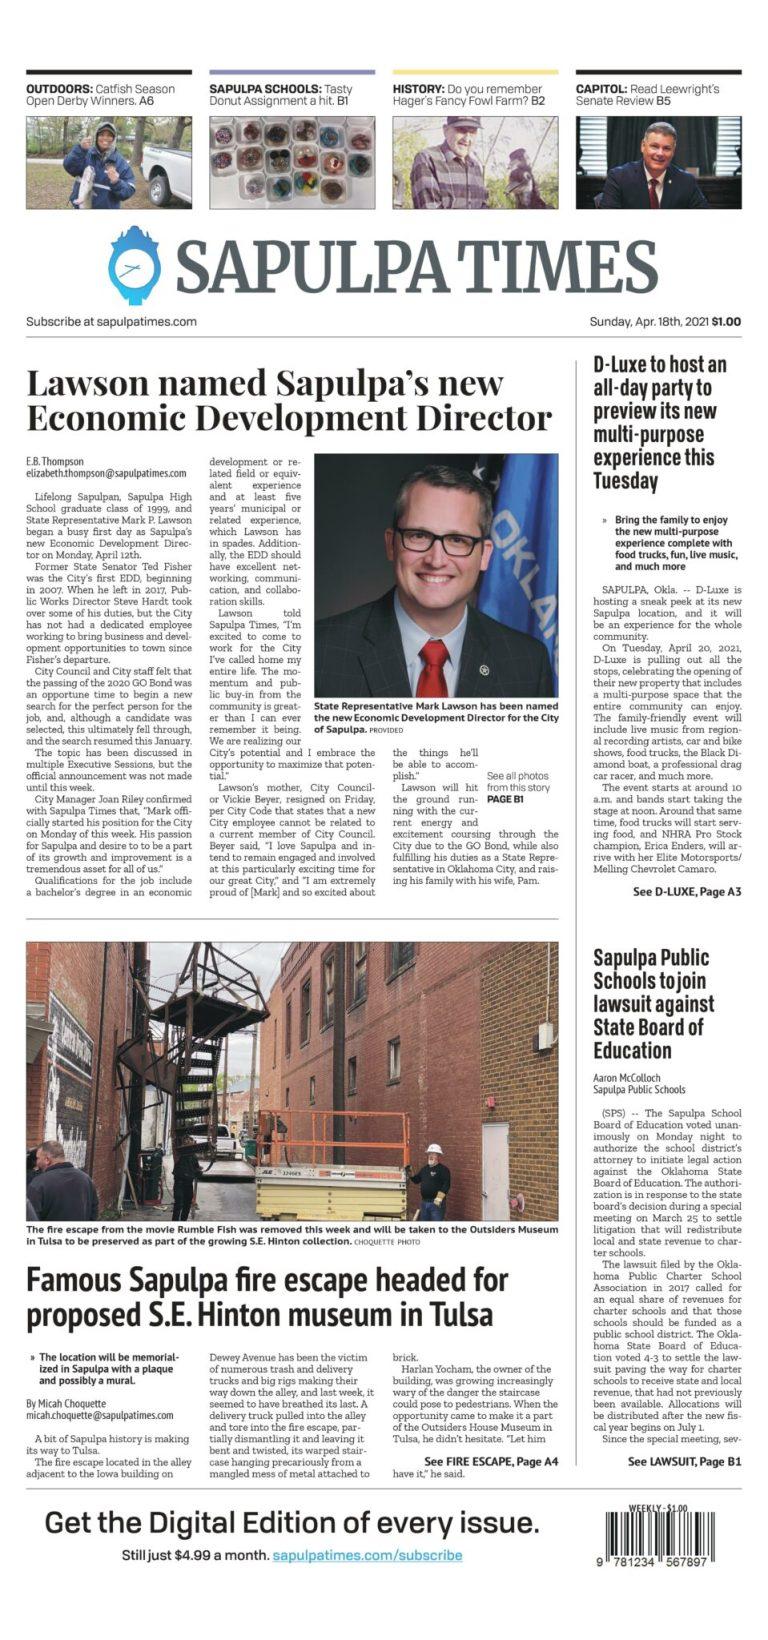 Sapulpa Times Digital Edition 04/18/2021